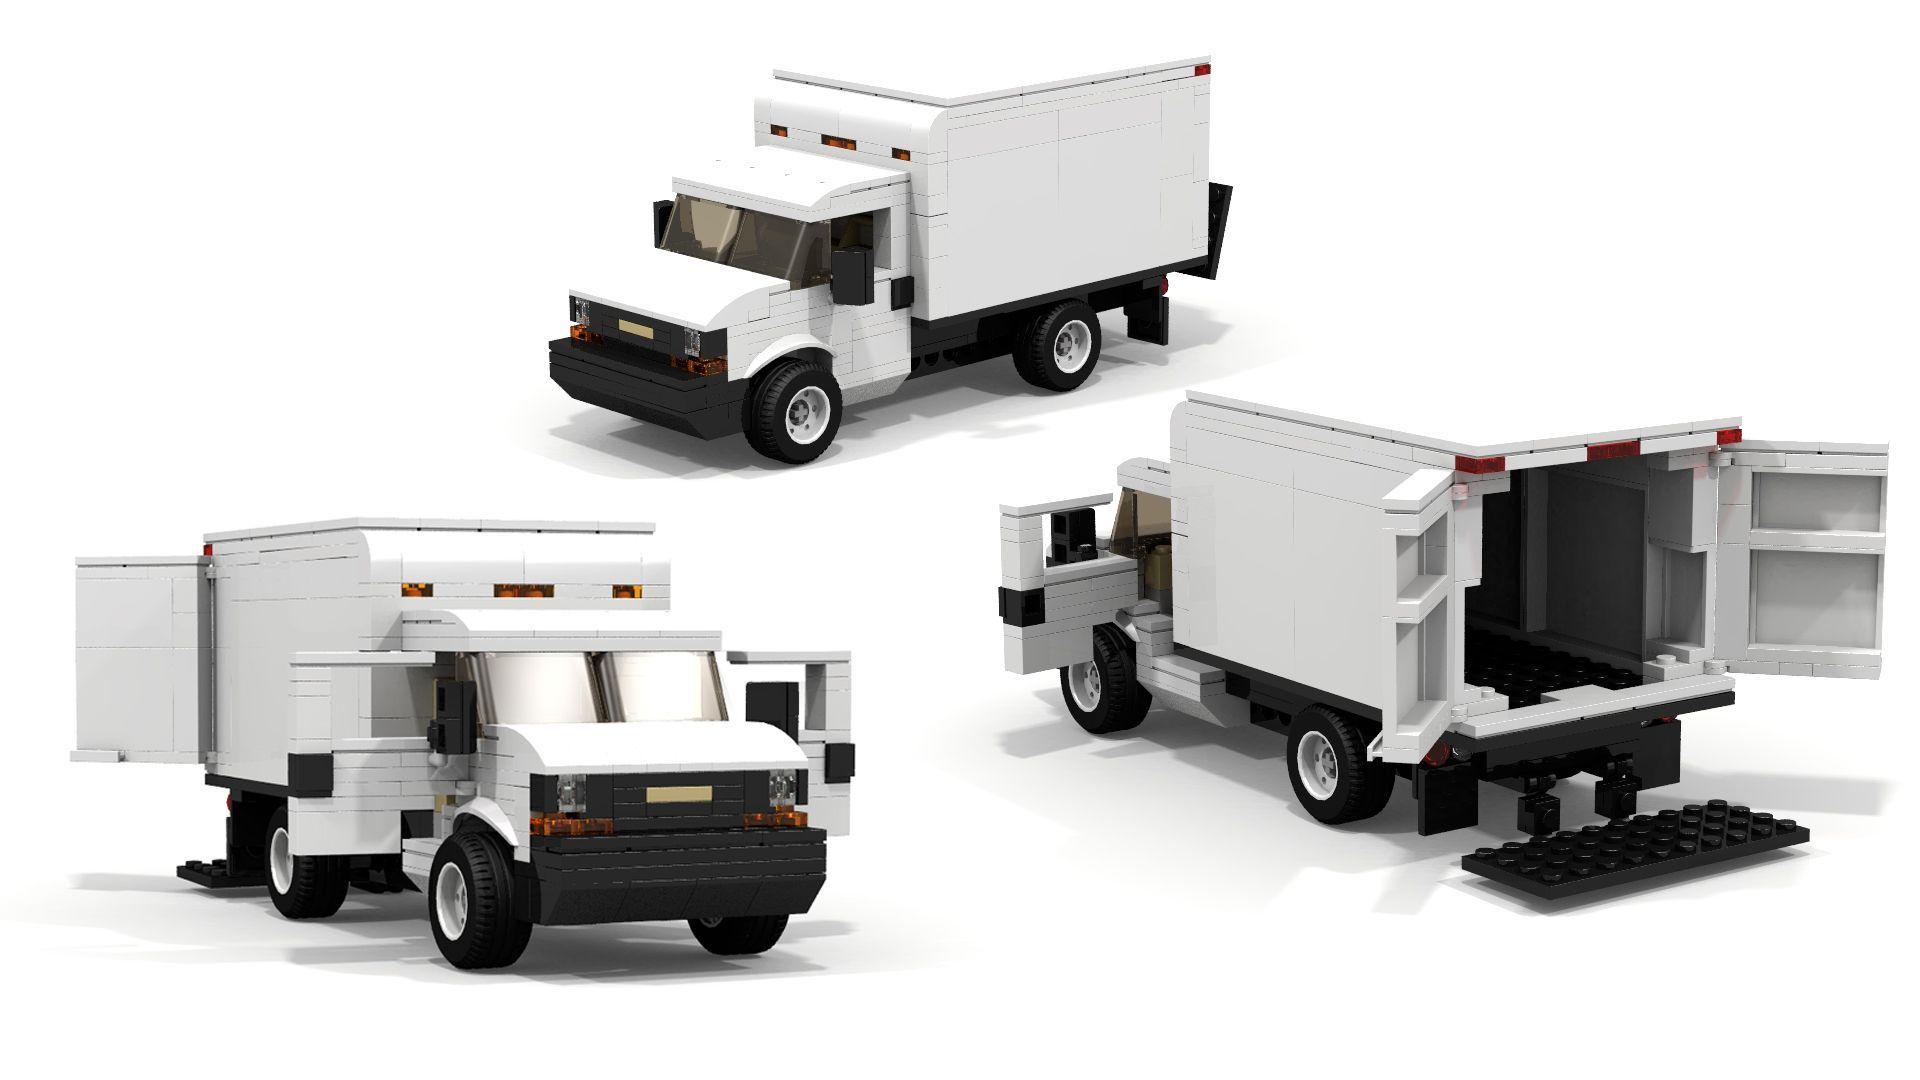 Lego Chevrolet Express Cargo Truck Moc Building Instructions Lego